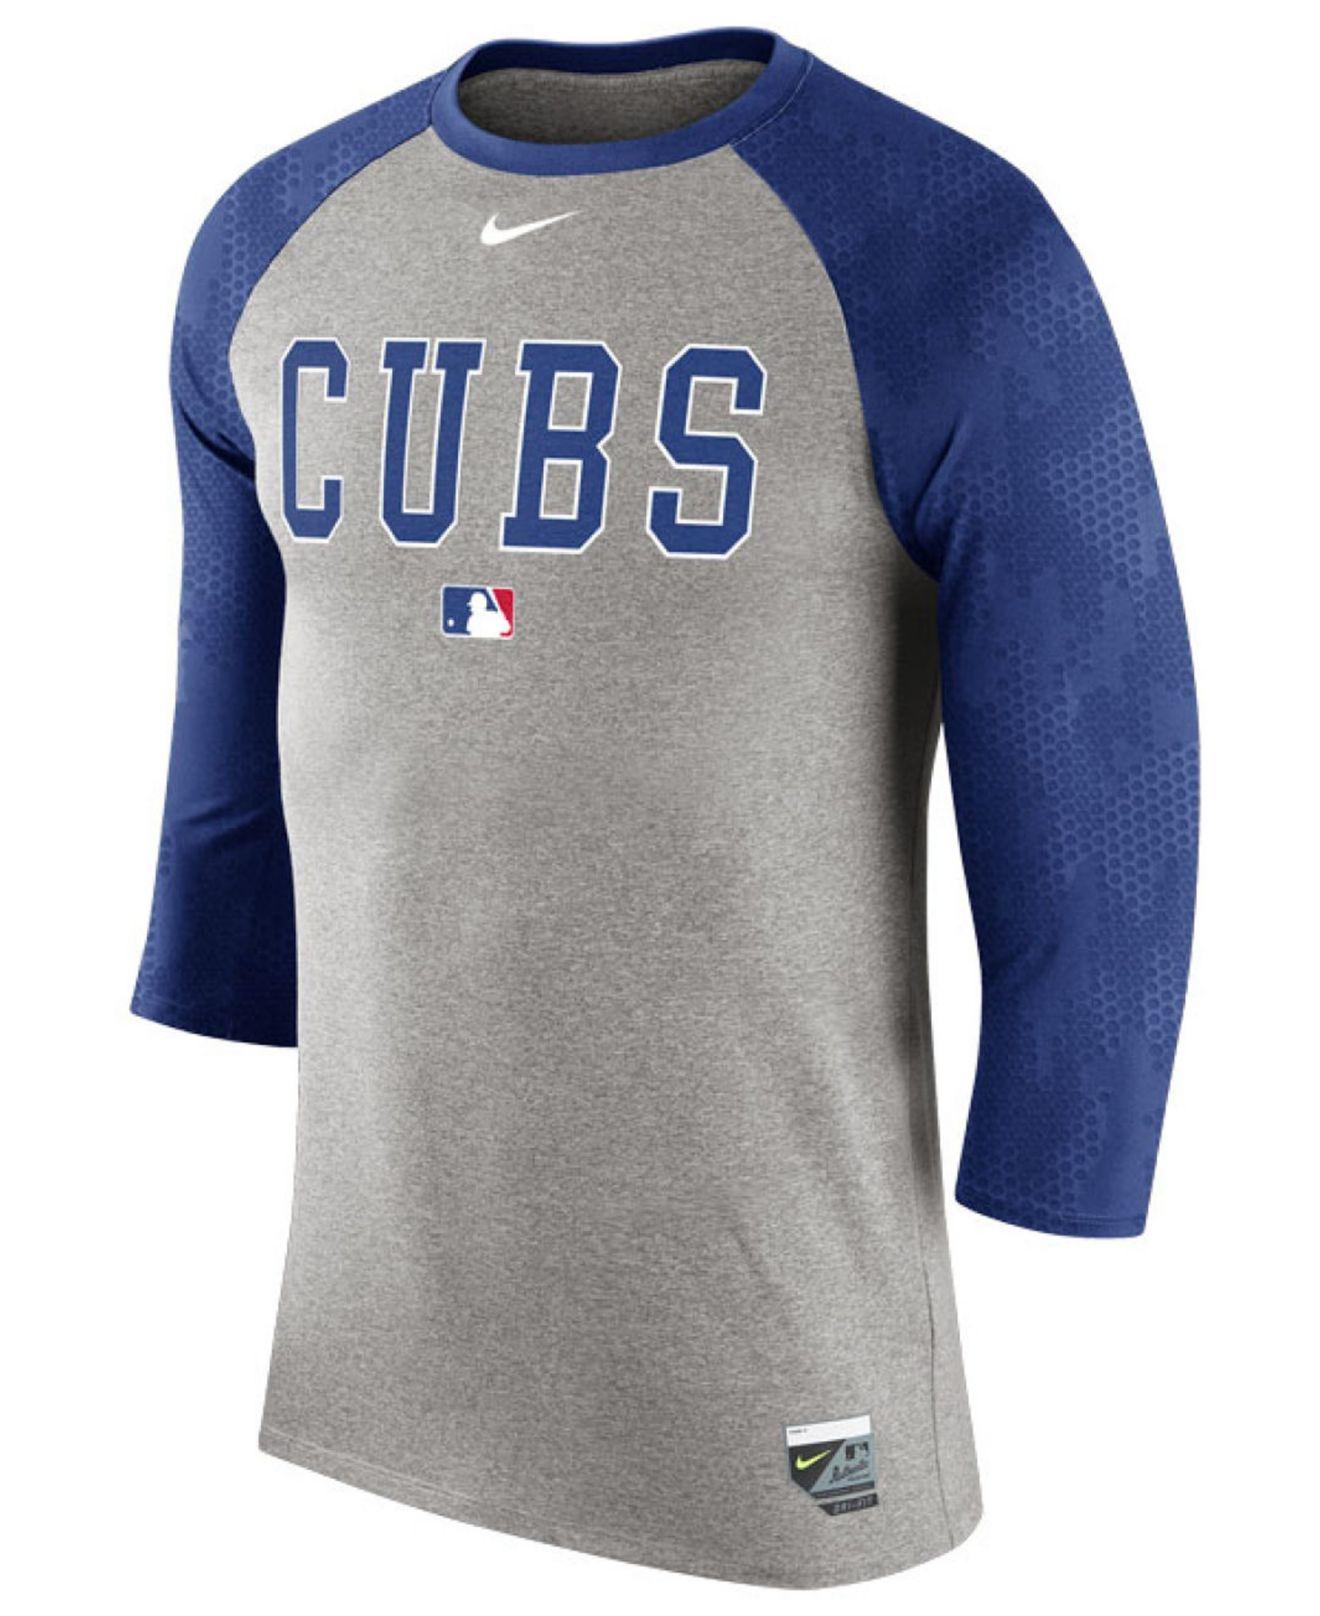 43fd9033 Nike Men's Chicago Cubs Ac Legend Raglan T-shirt in Pink for Men - Lyst